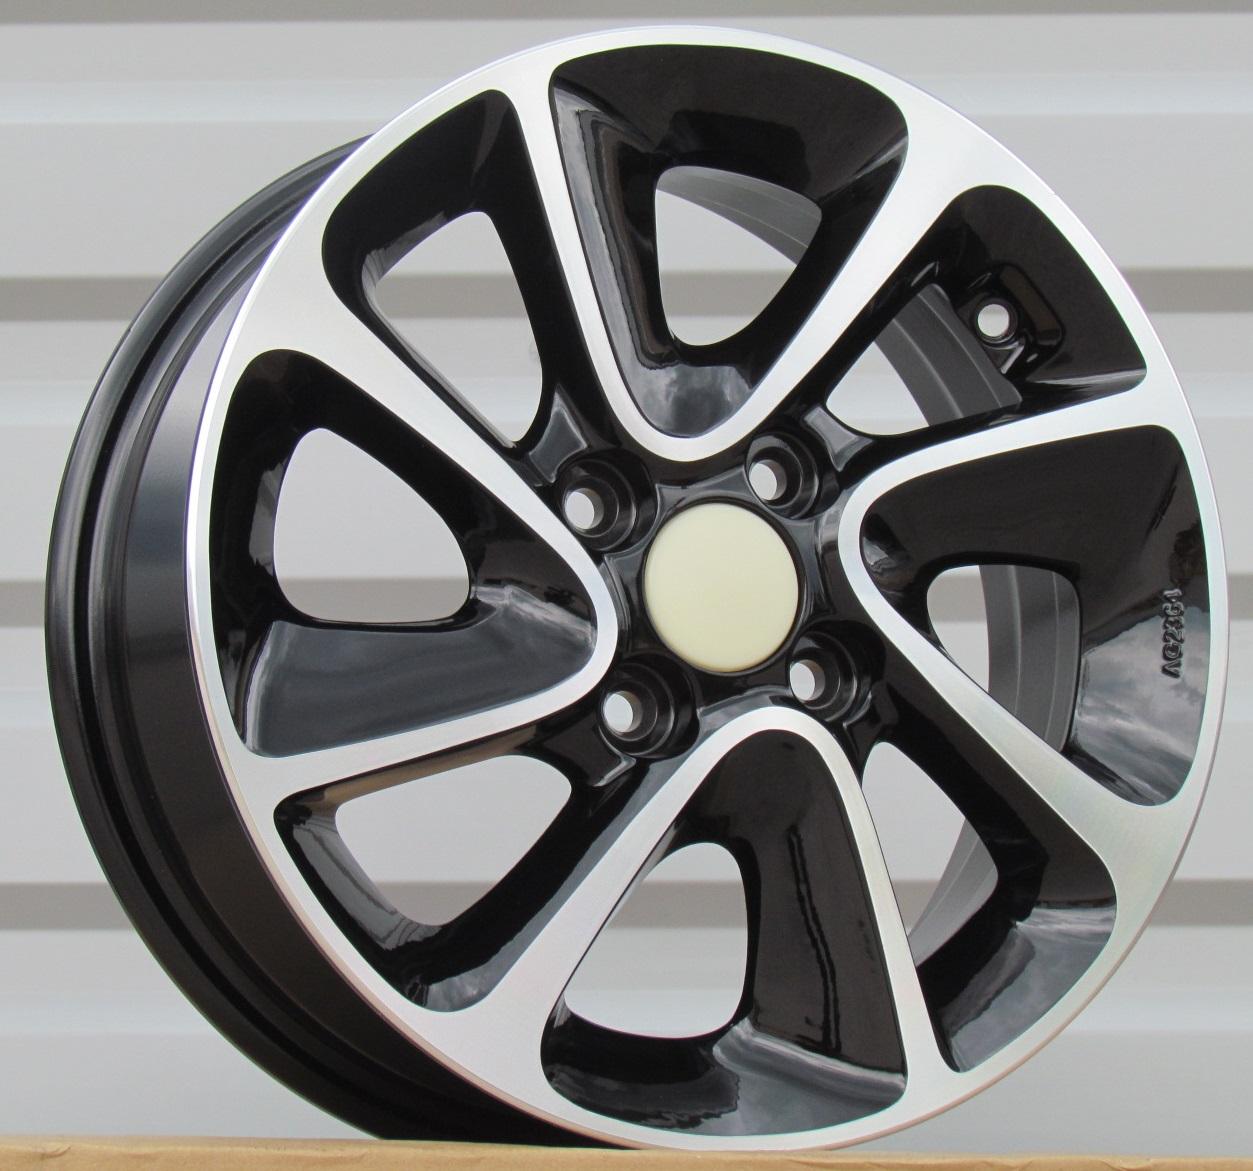 ALU PLATIŠČA H14X5 4X100 ET41 54.1 BK5387 MB+Powder Coating RWR Hyundai (+2eur) (K4)## 5x14 ET41 4x100